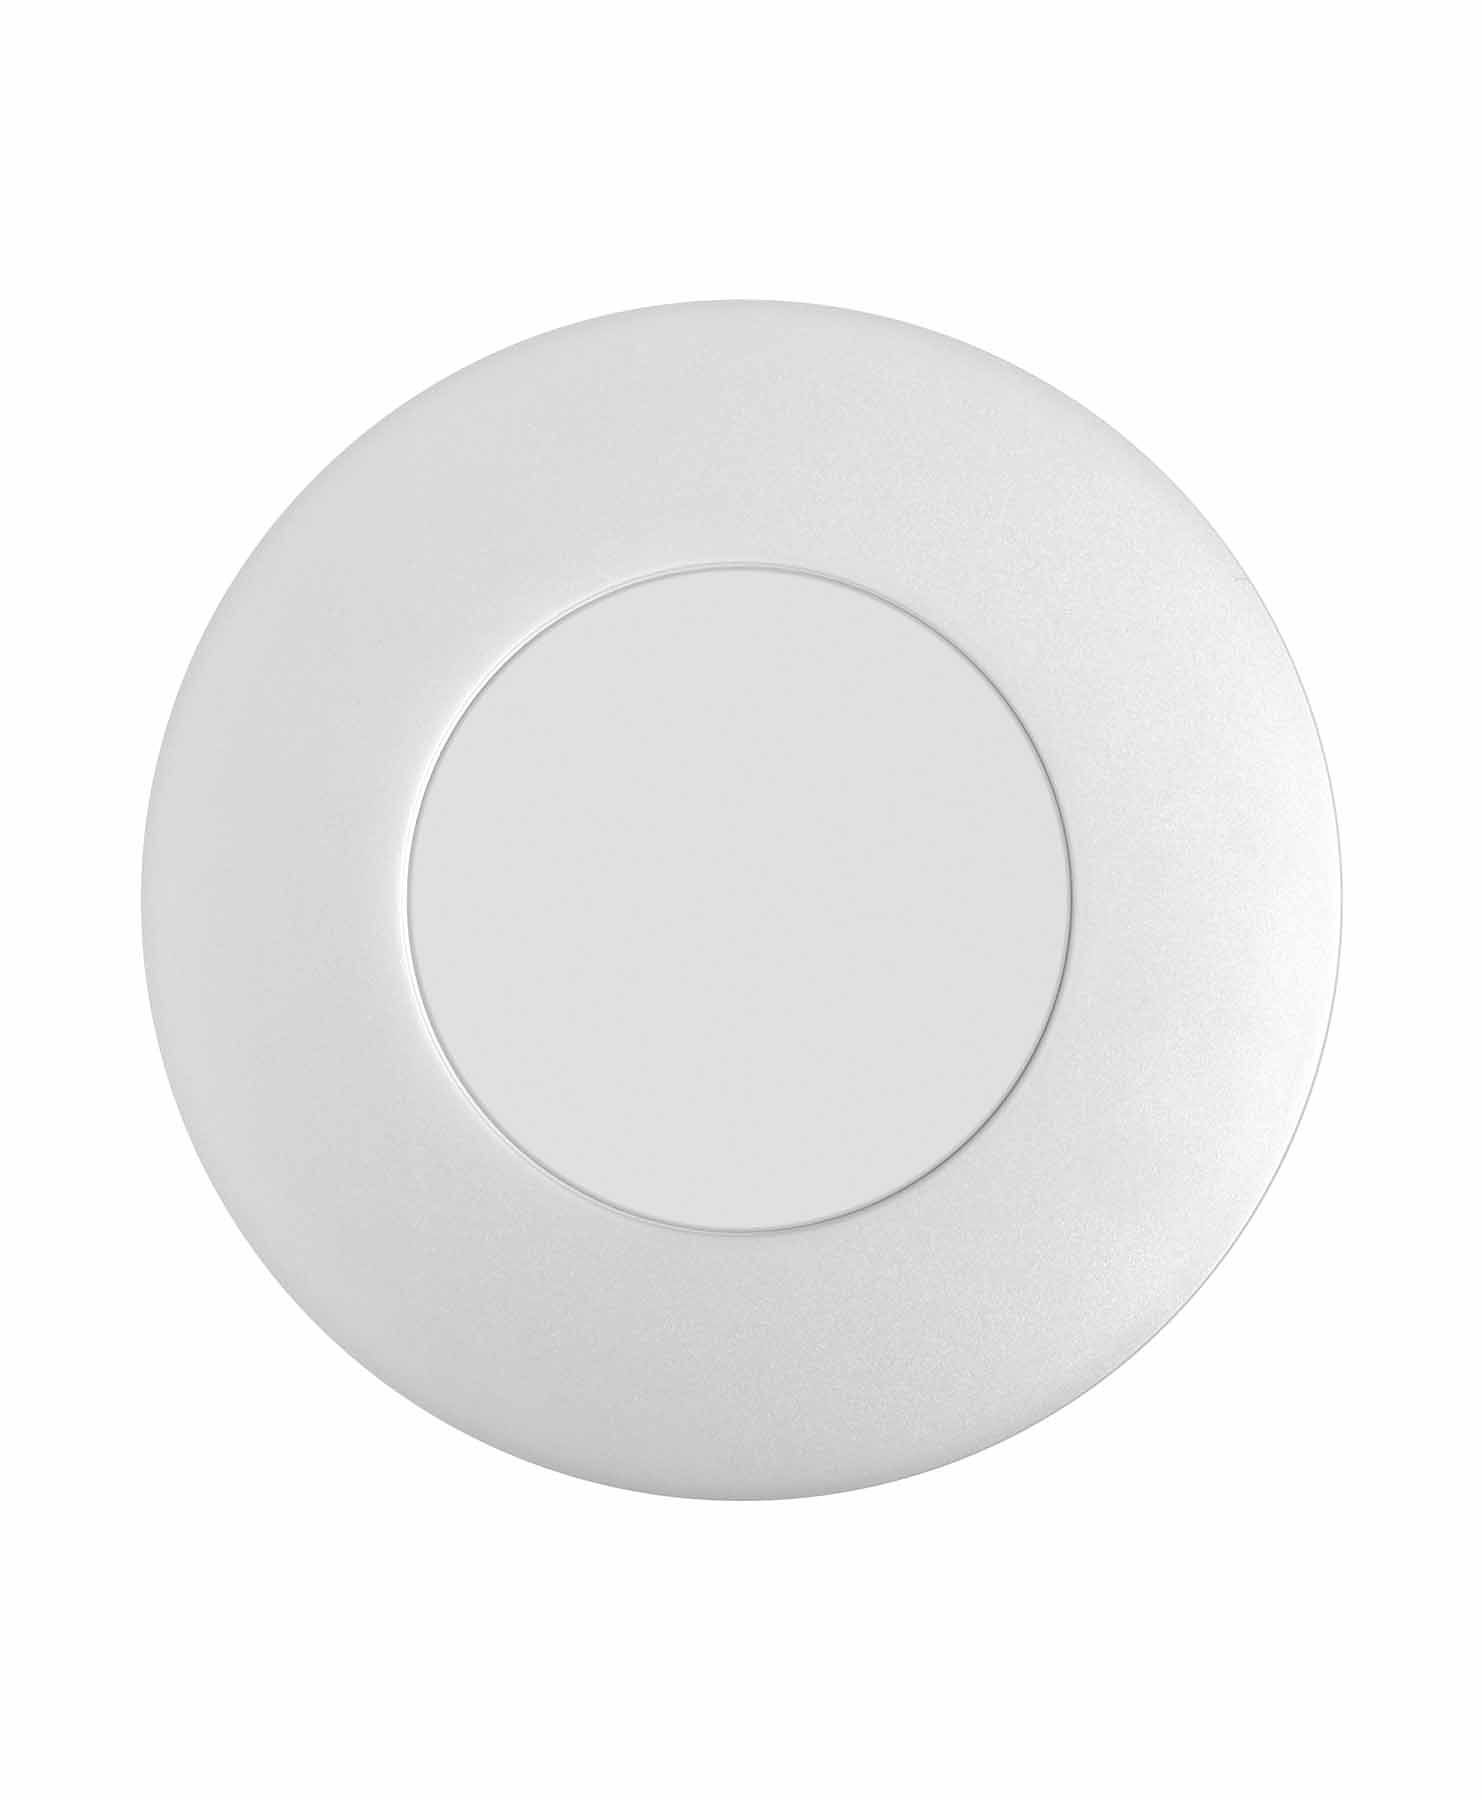 Osram Lightify Smart Home - Surface Light W »Surface Light W28 / 1800 Lumen«